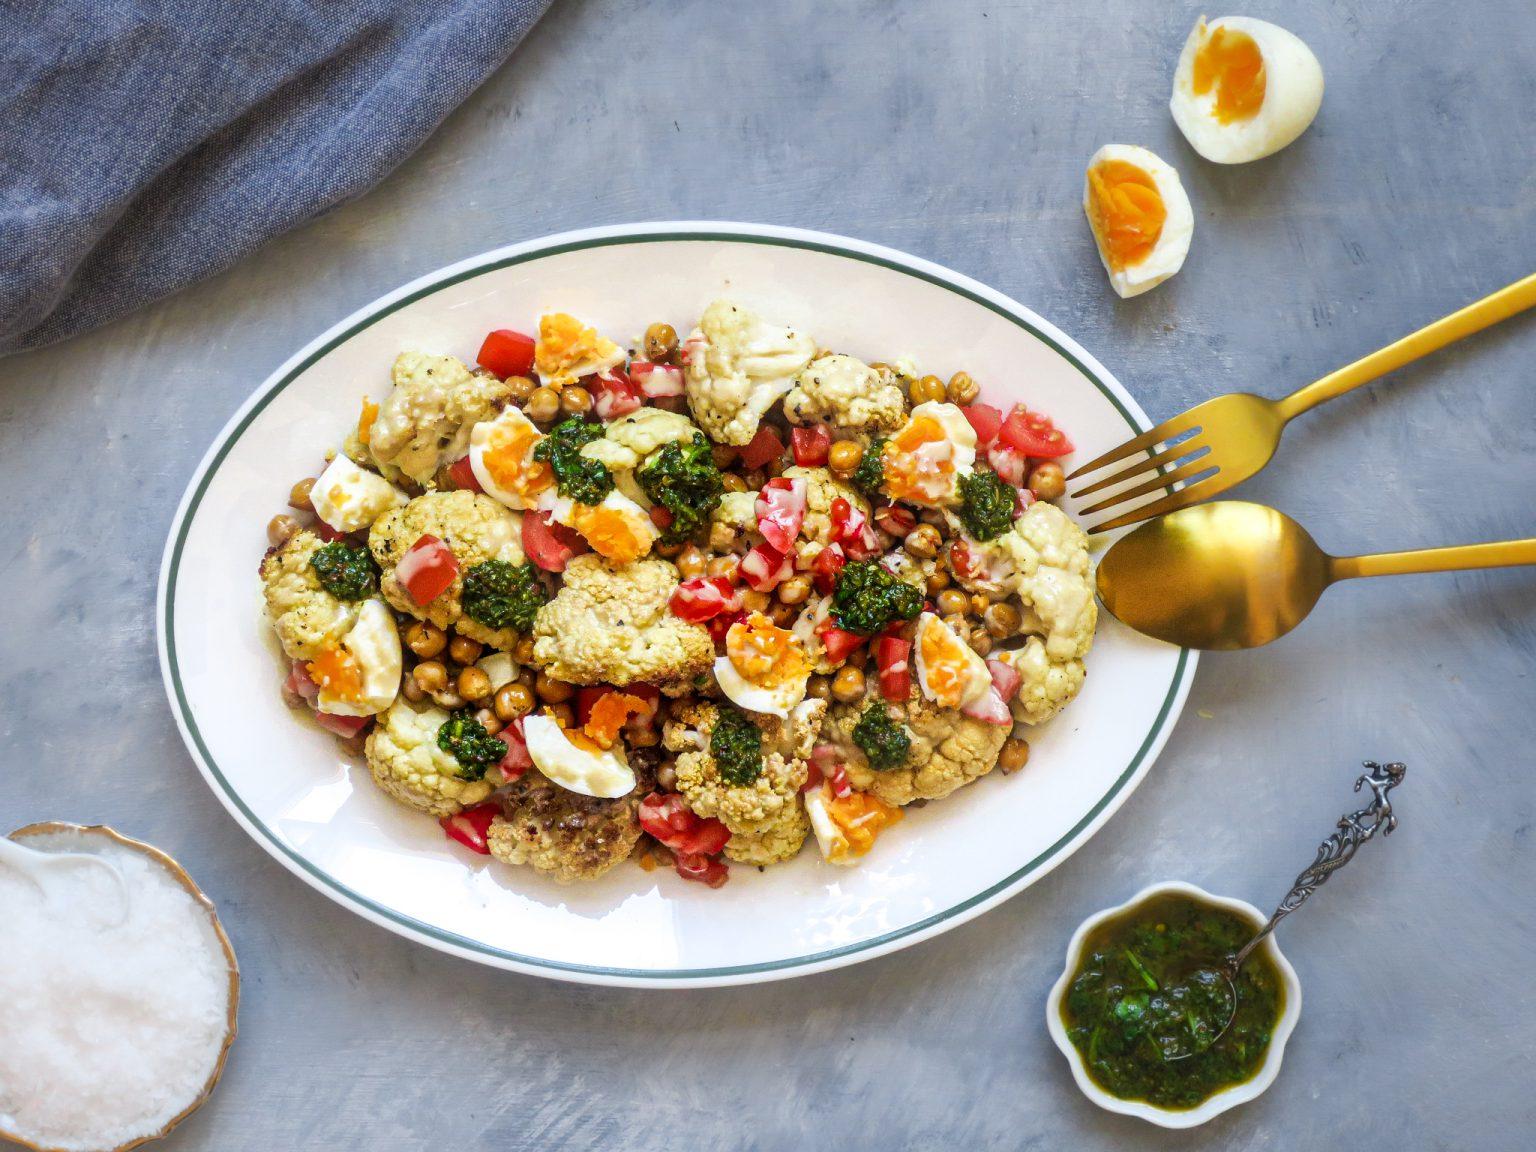 Salade met gegrilde bloemkool, kikkererwten, ei & groene harissa